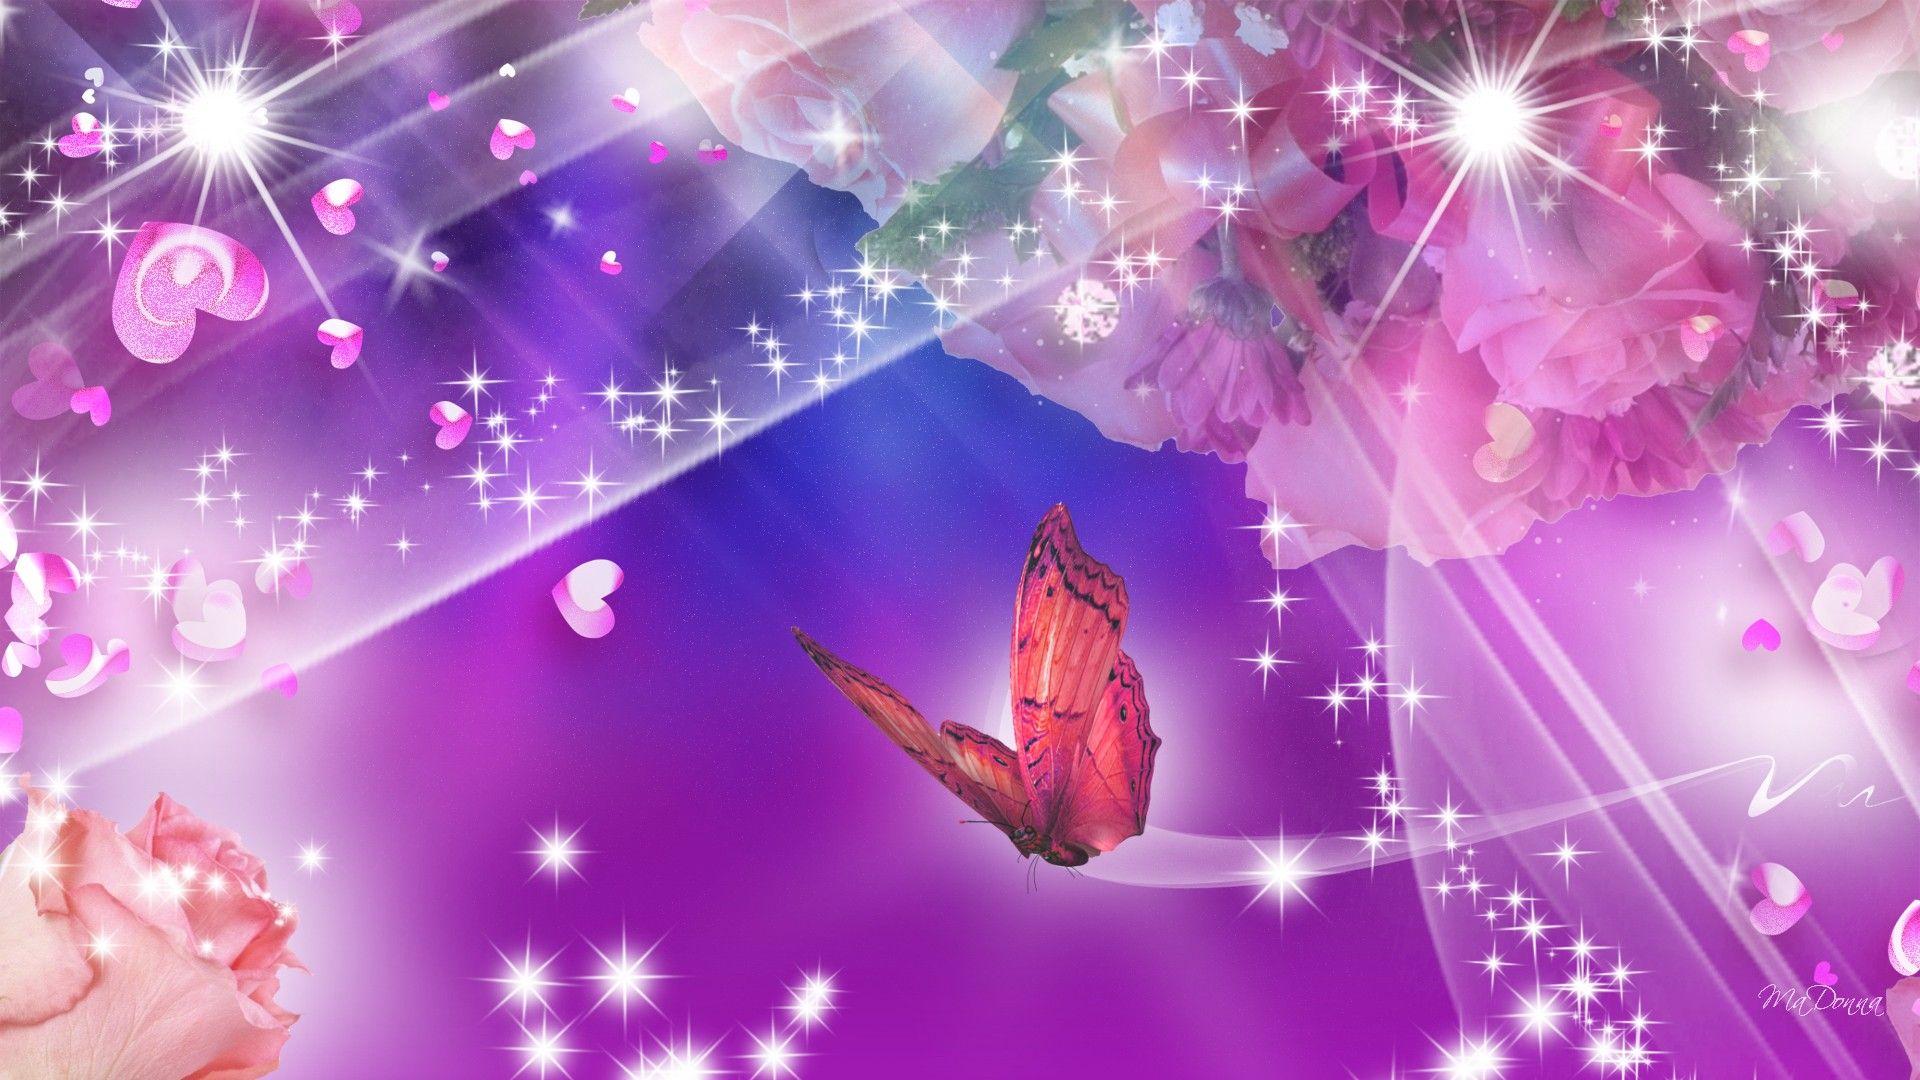 Wallpaper download free image search hd - Hd Roses On Bright Wallpaper Download Free 73316